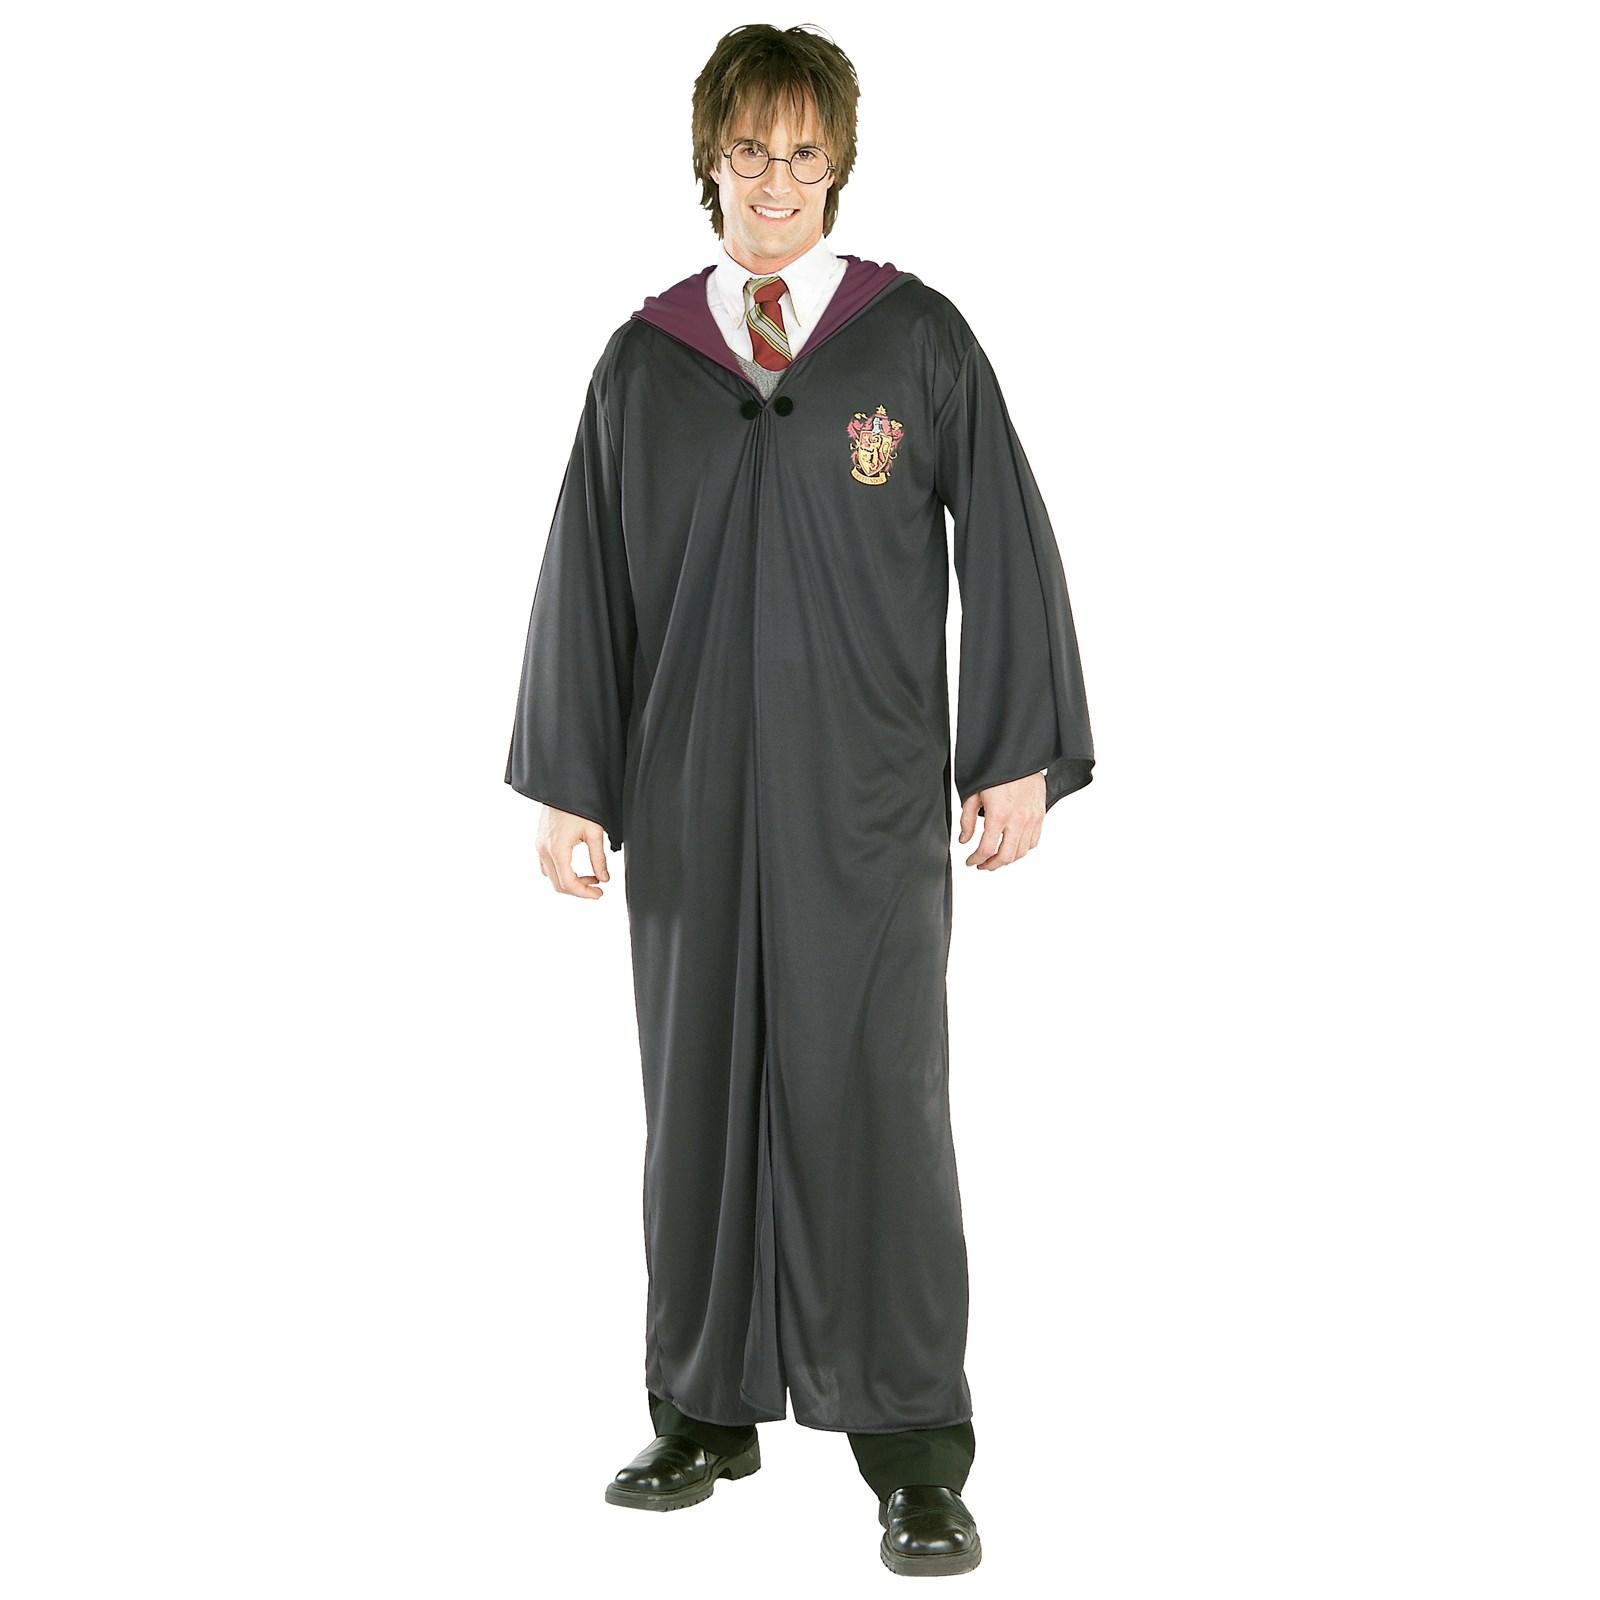 Harry Potter Robe Adult Costume | BuyCostumes.com